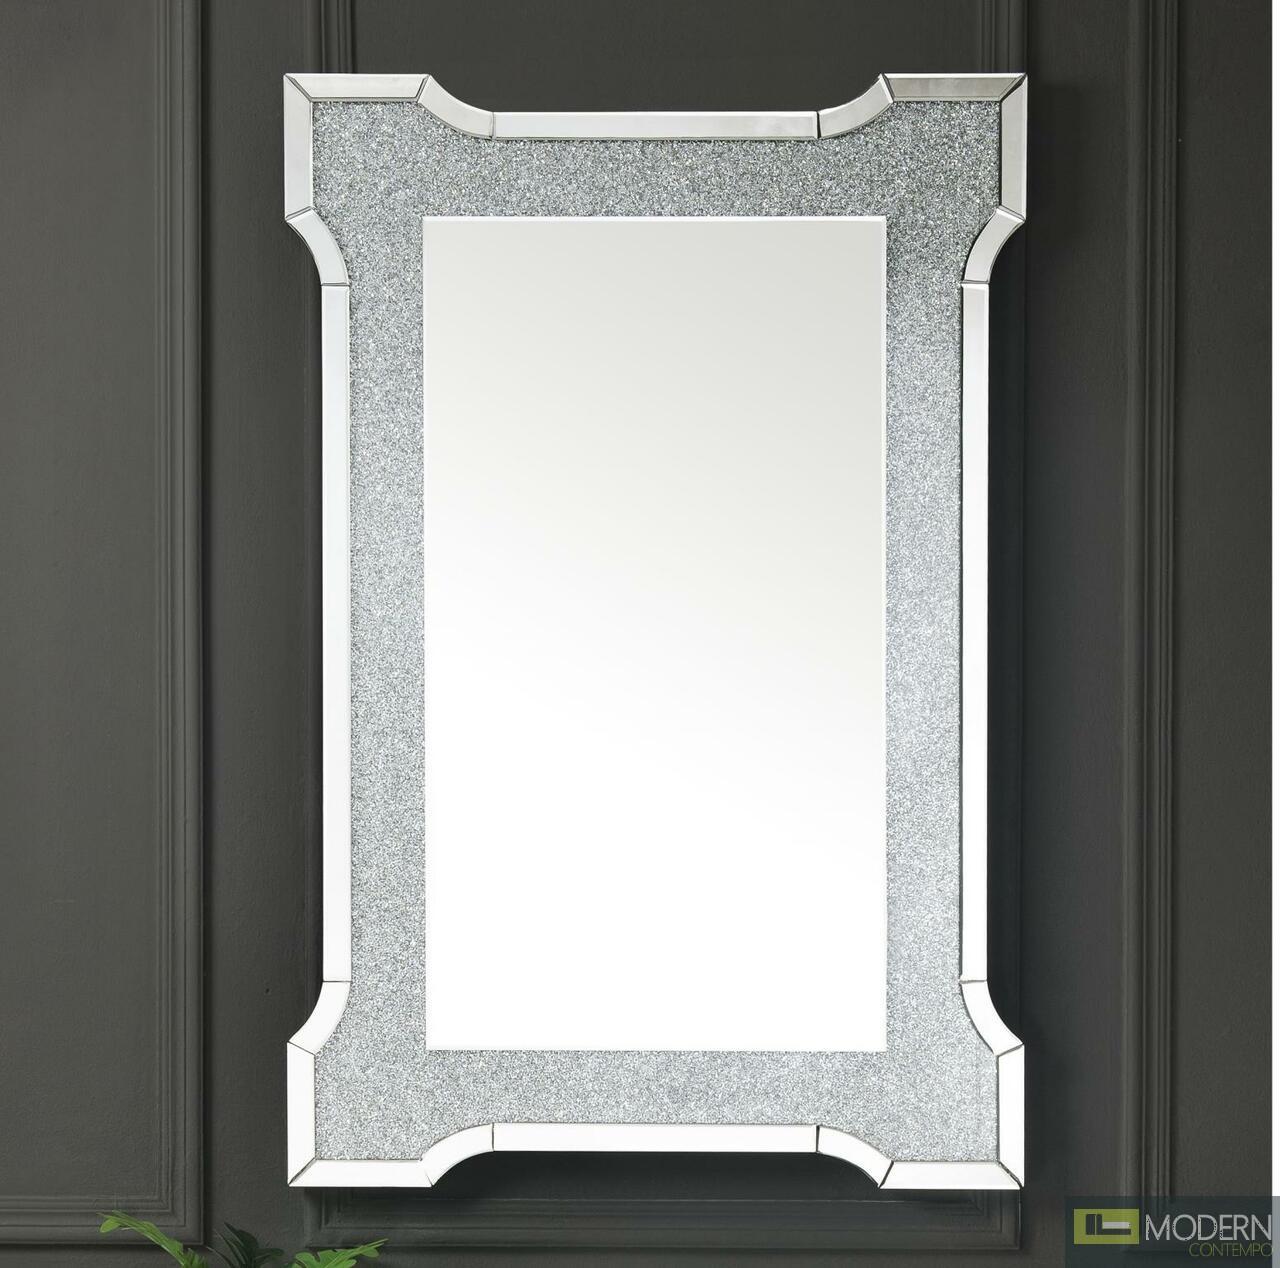 Phoenix Wall Decor in Mirrored & Faux Diamonds